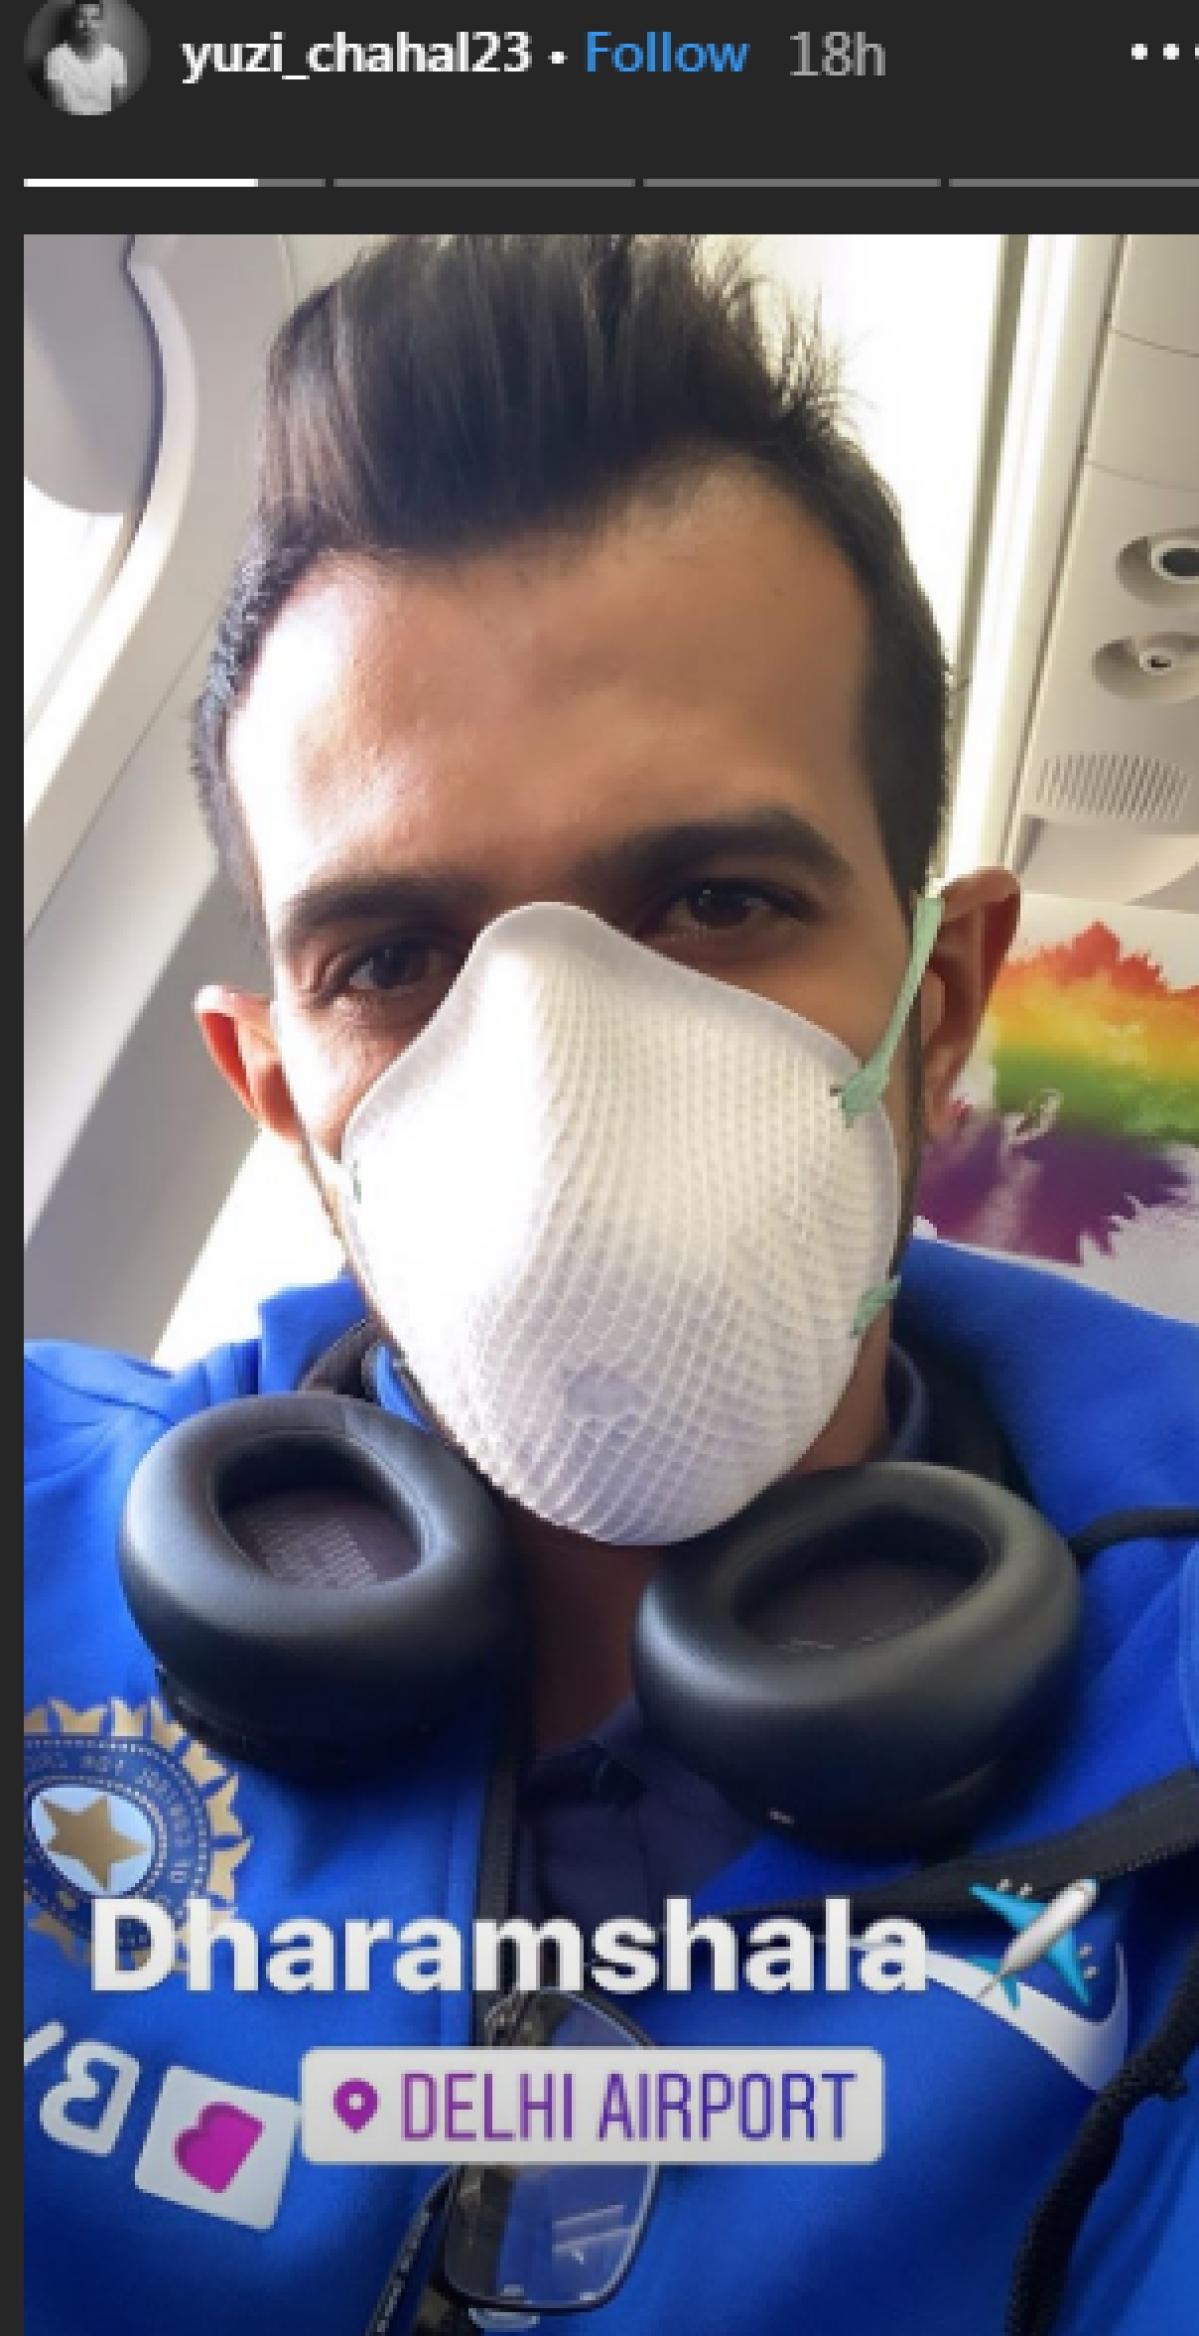 Latest Coronavirus update in India: Yuzvendra Chahal wears mask on way  to Dharamshala for first ODI